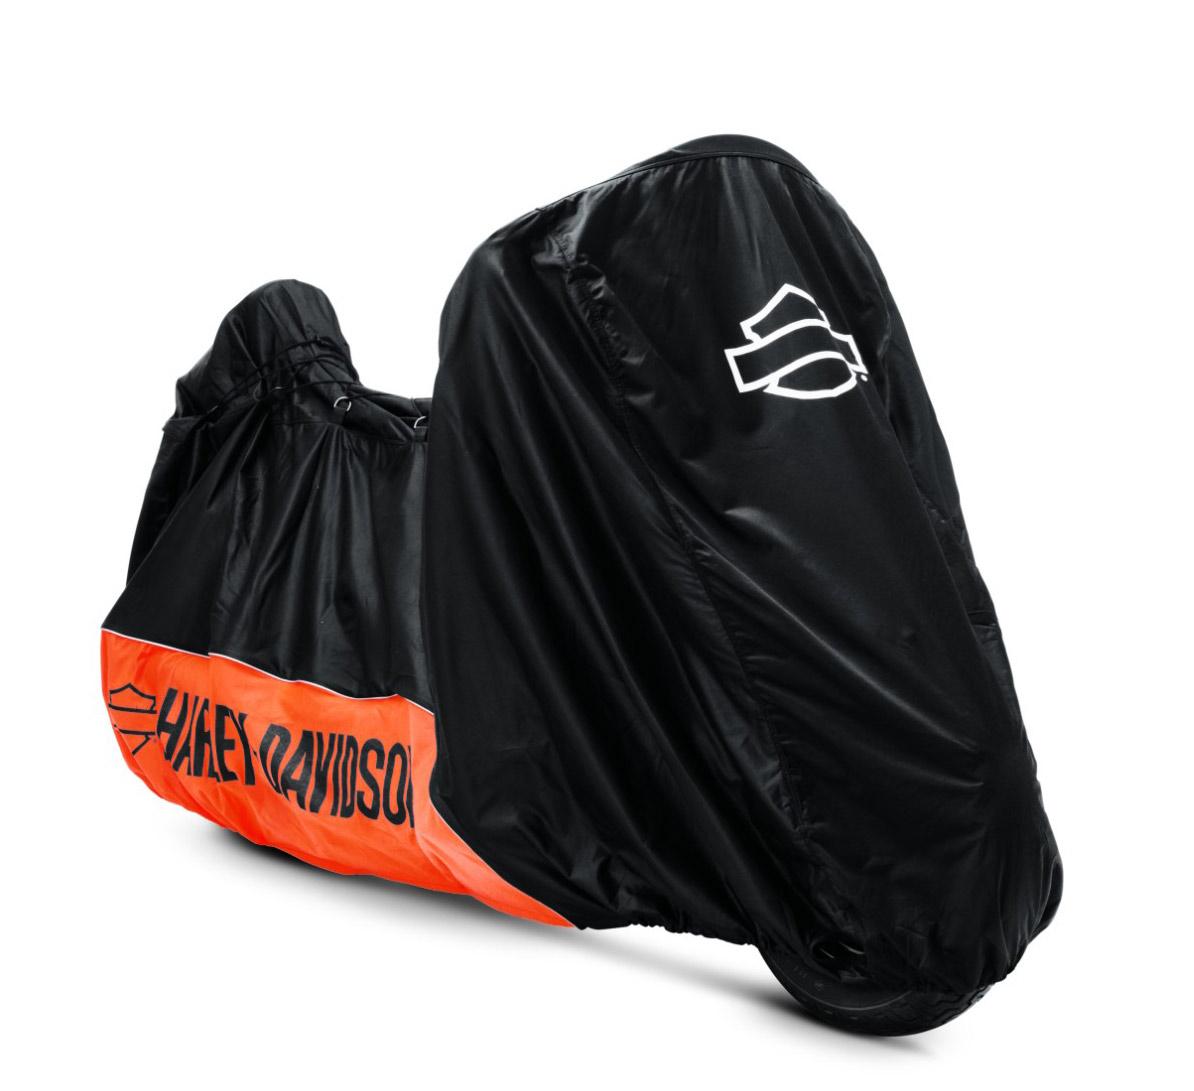 Harley Davidson Bike Covers >> 93100018 Harley Davidson Indoor Motorcycle Cover